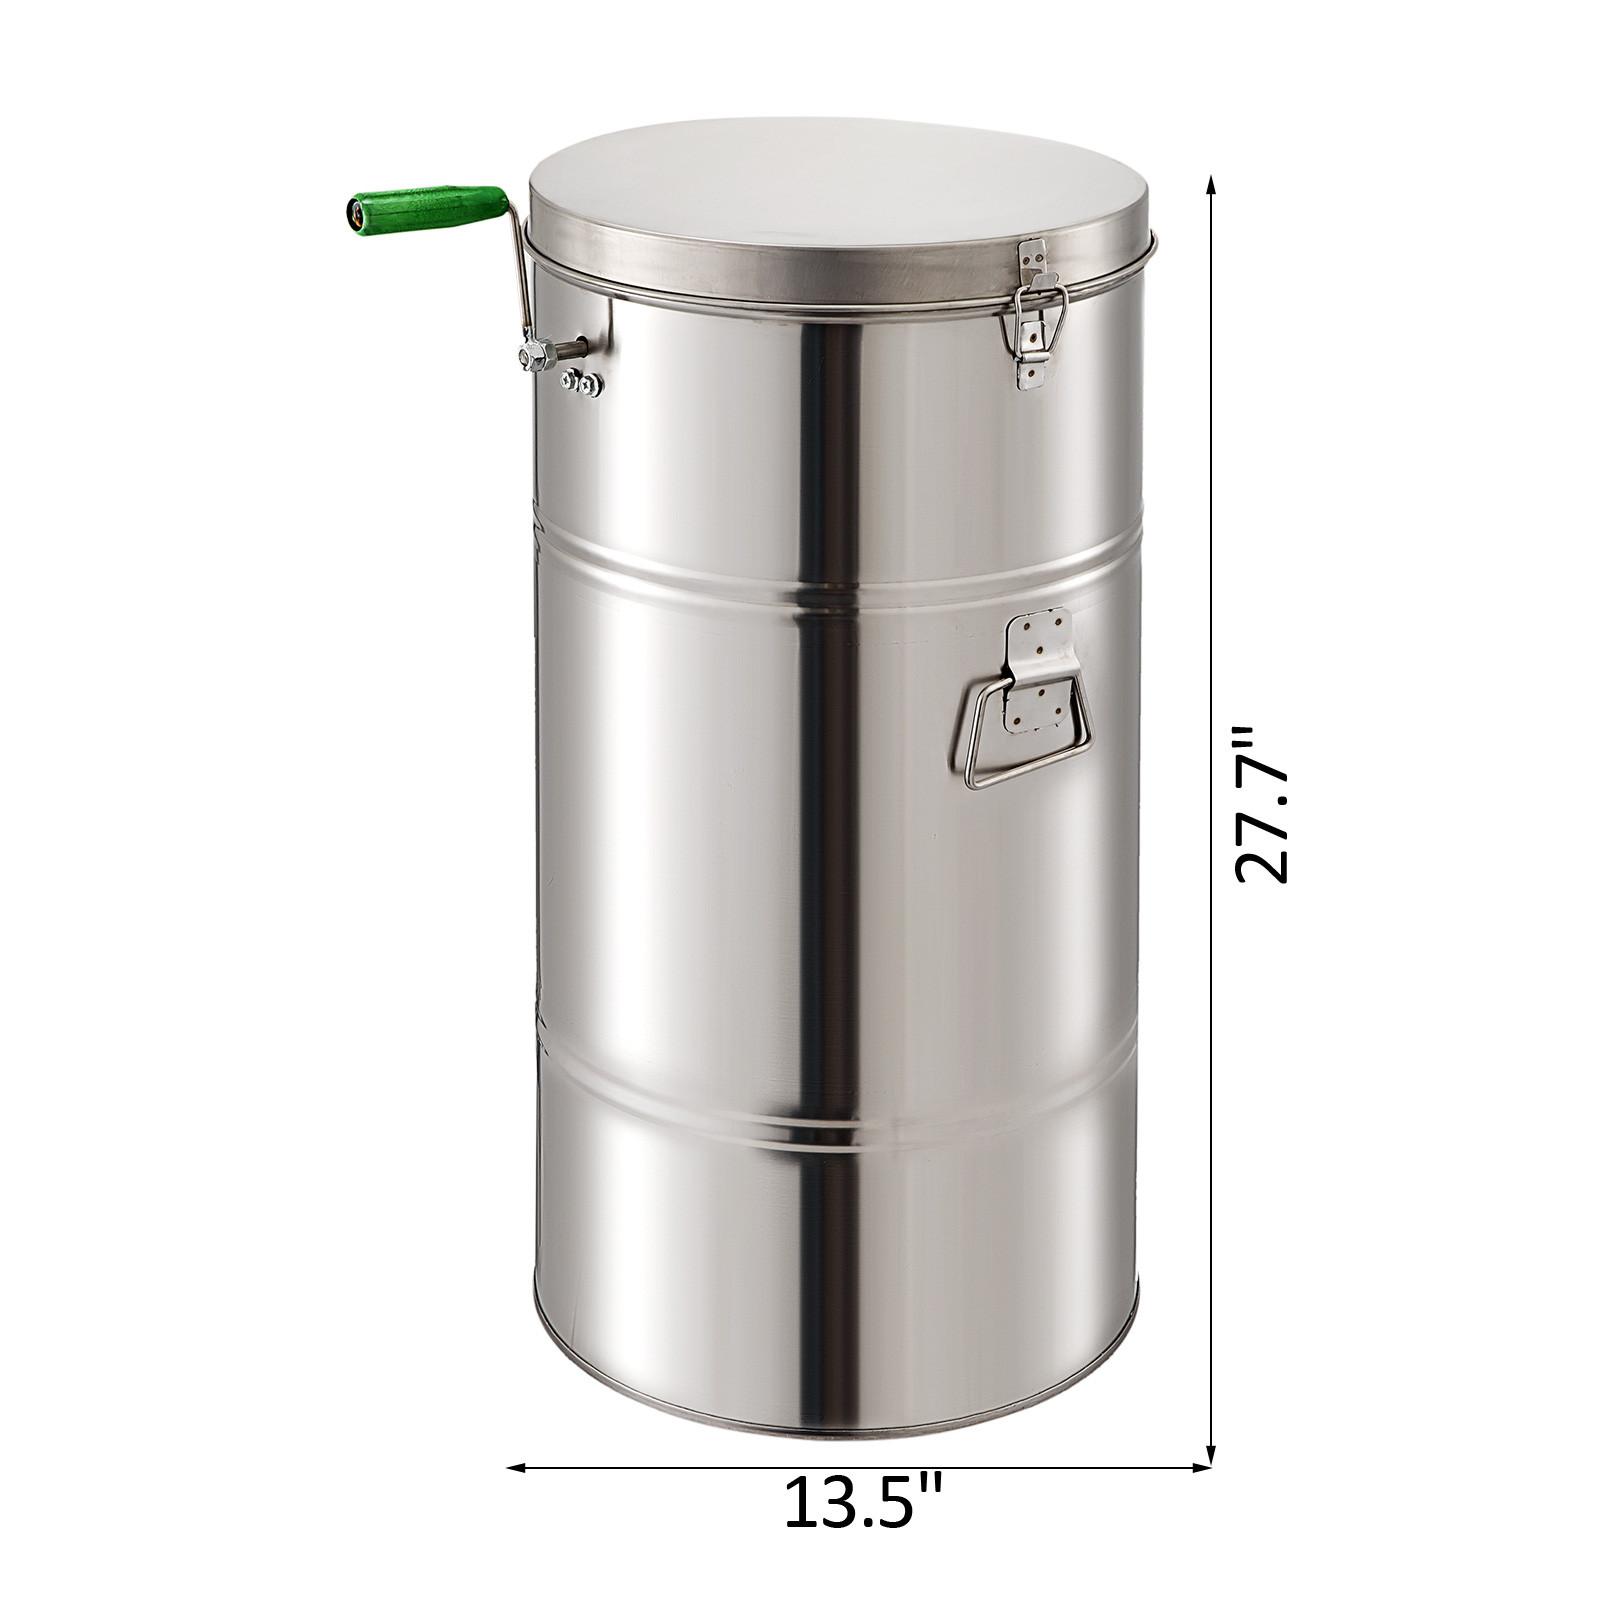 Extracteur-de-Miel-Electrique-manuelle-2-3-4-Cadres-En-Acier-Inox-Centrifugeuse miniature 14